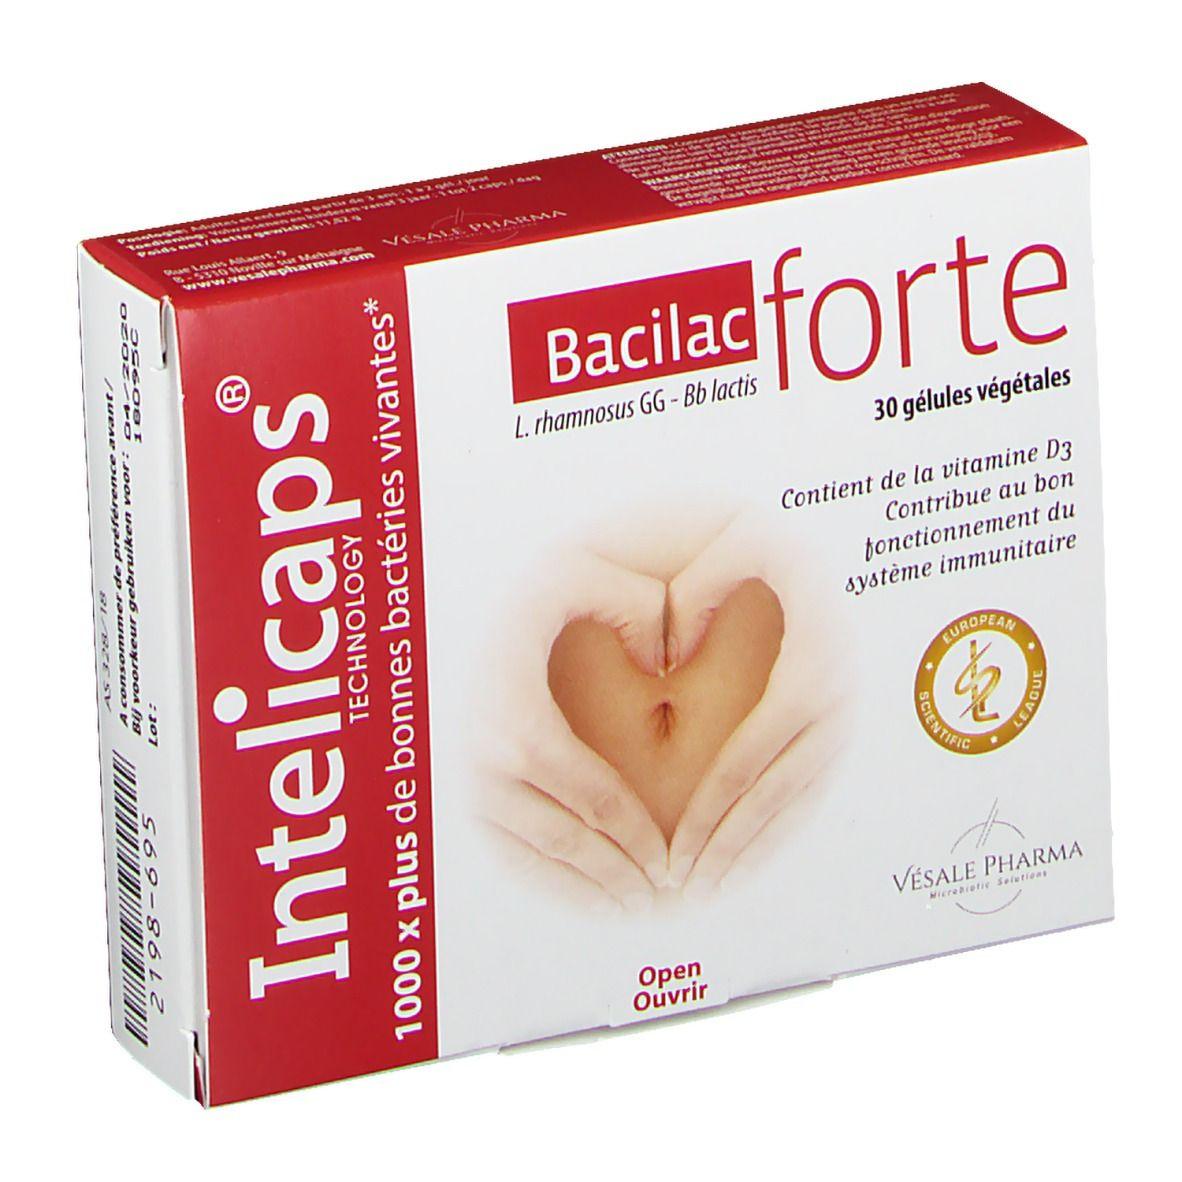 Image of Bacilac Forte